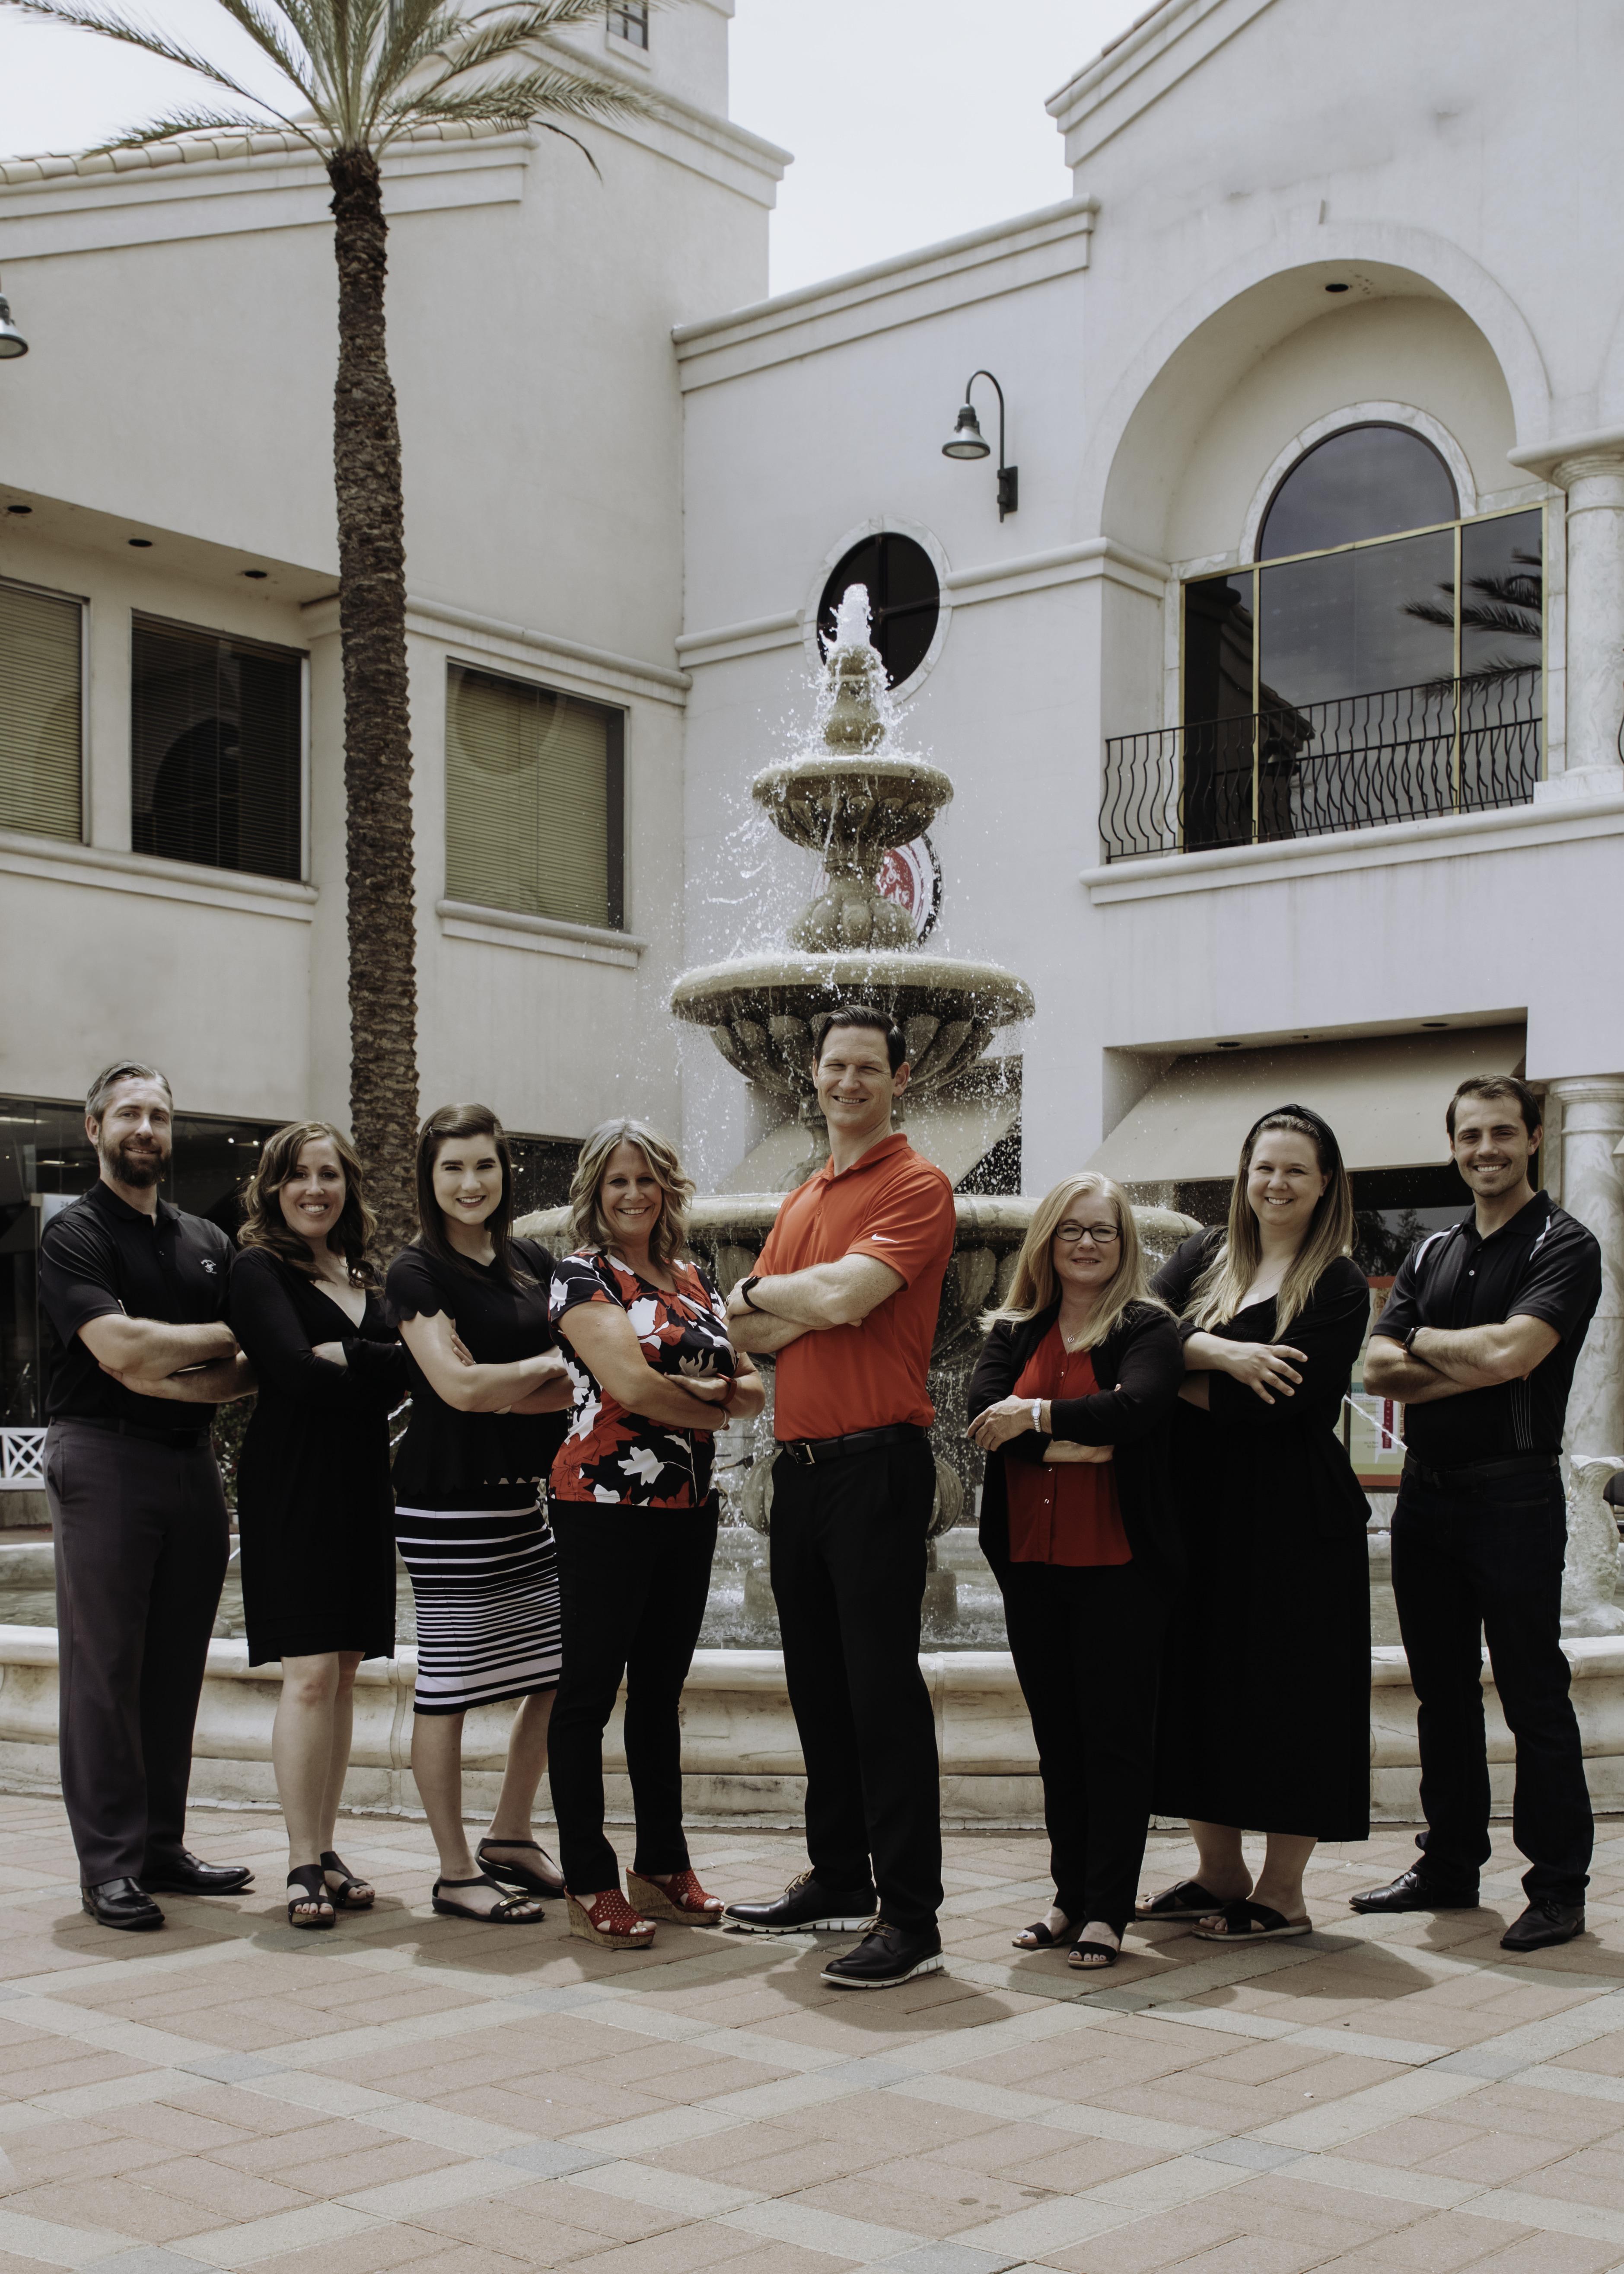 20210909-Elite Team Photo3.jpg